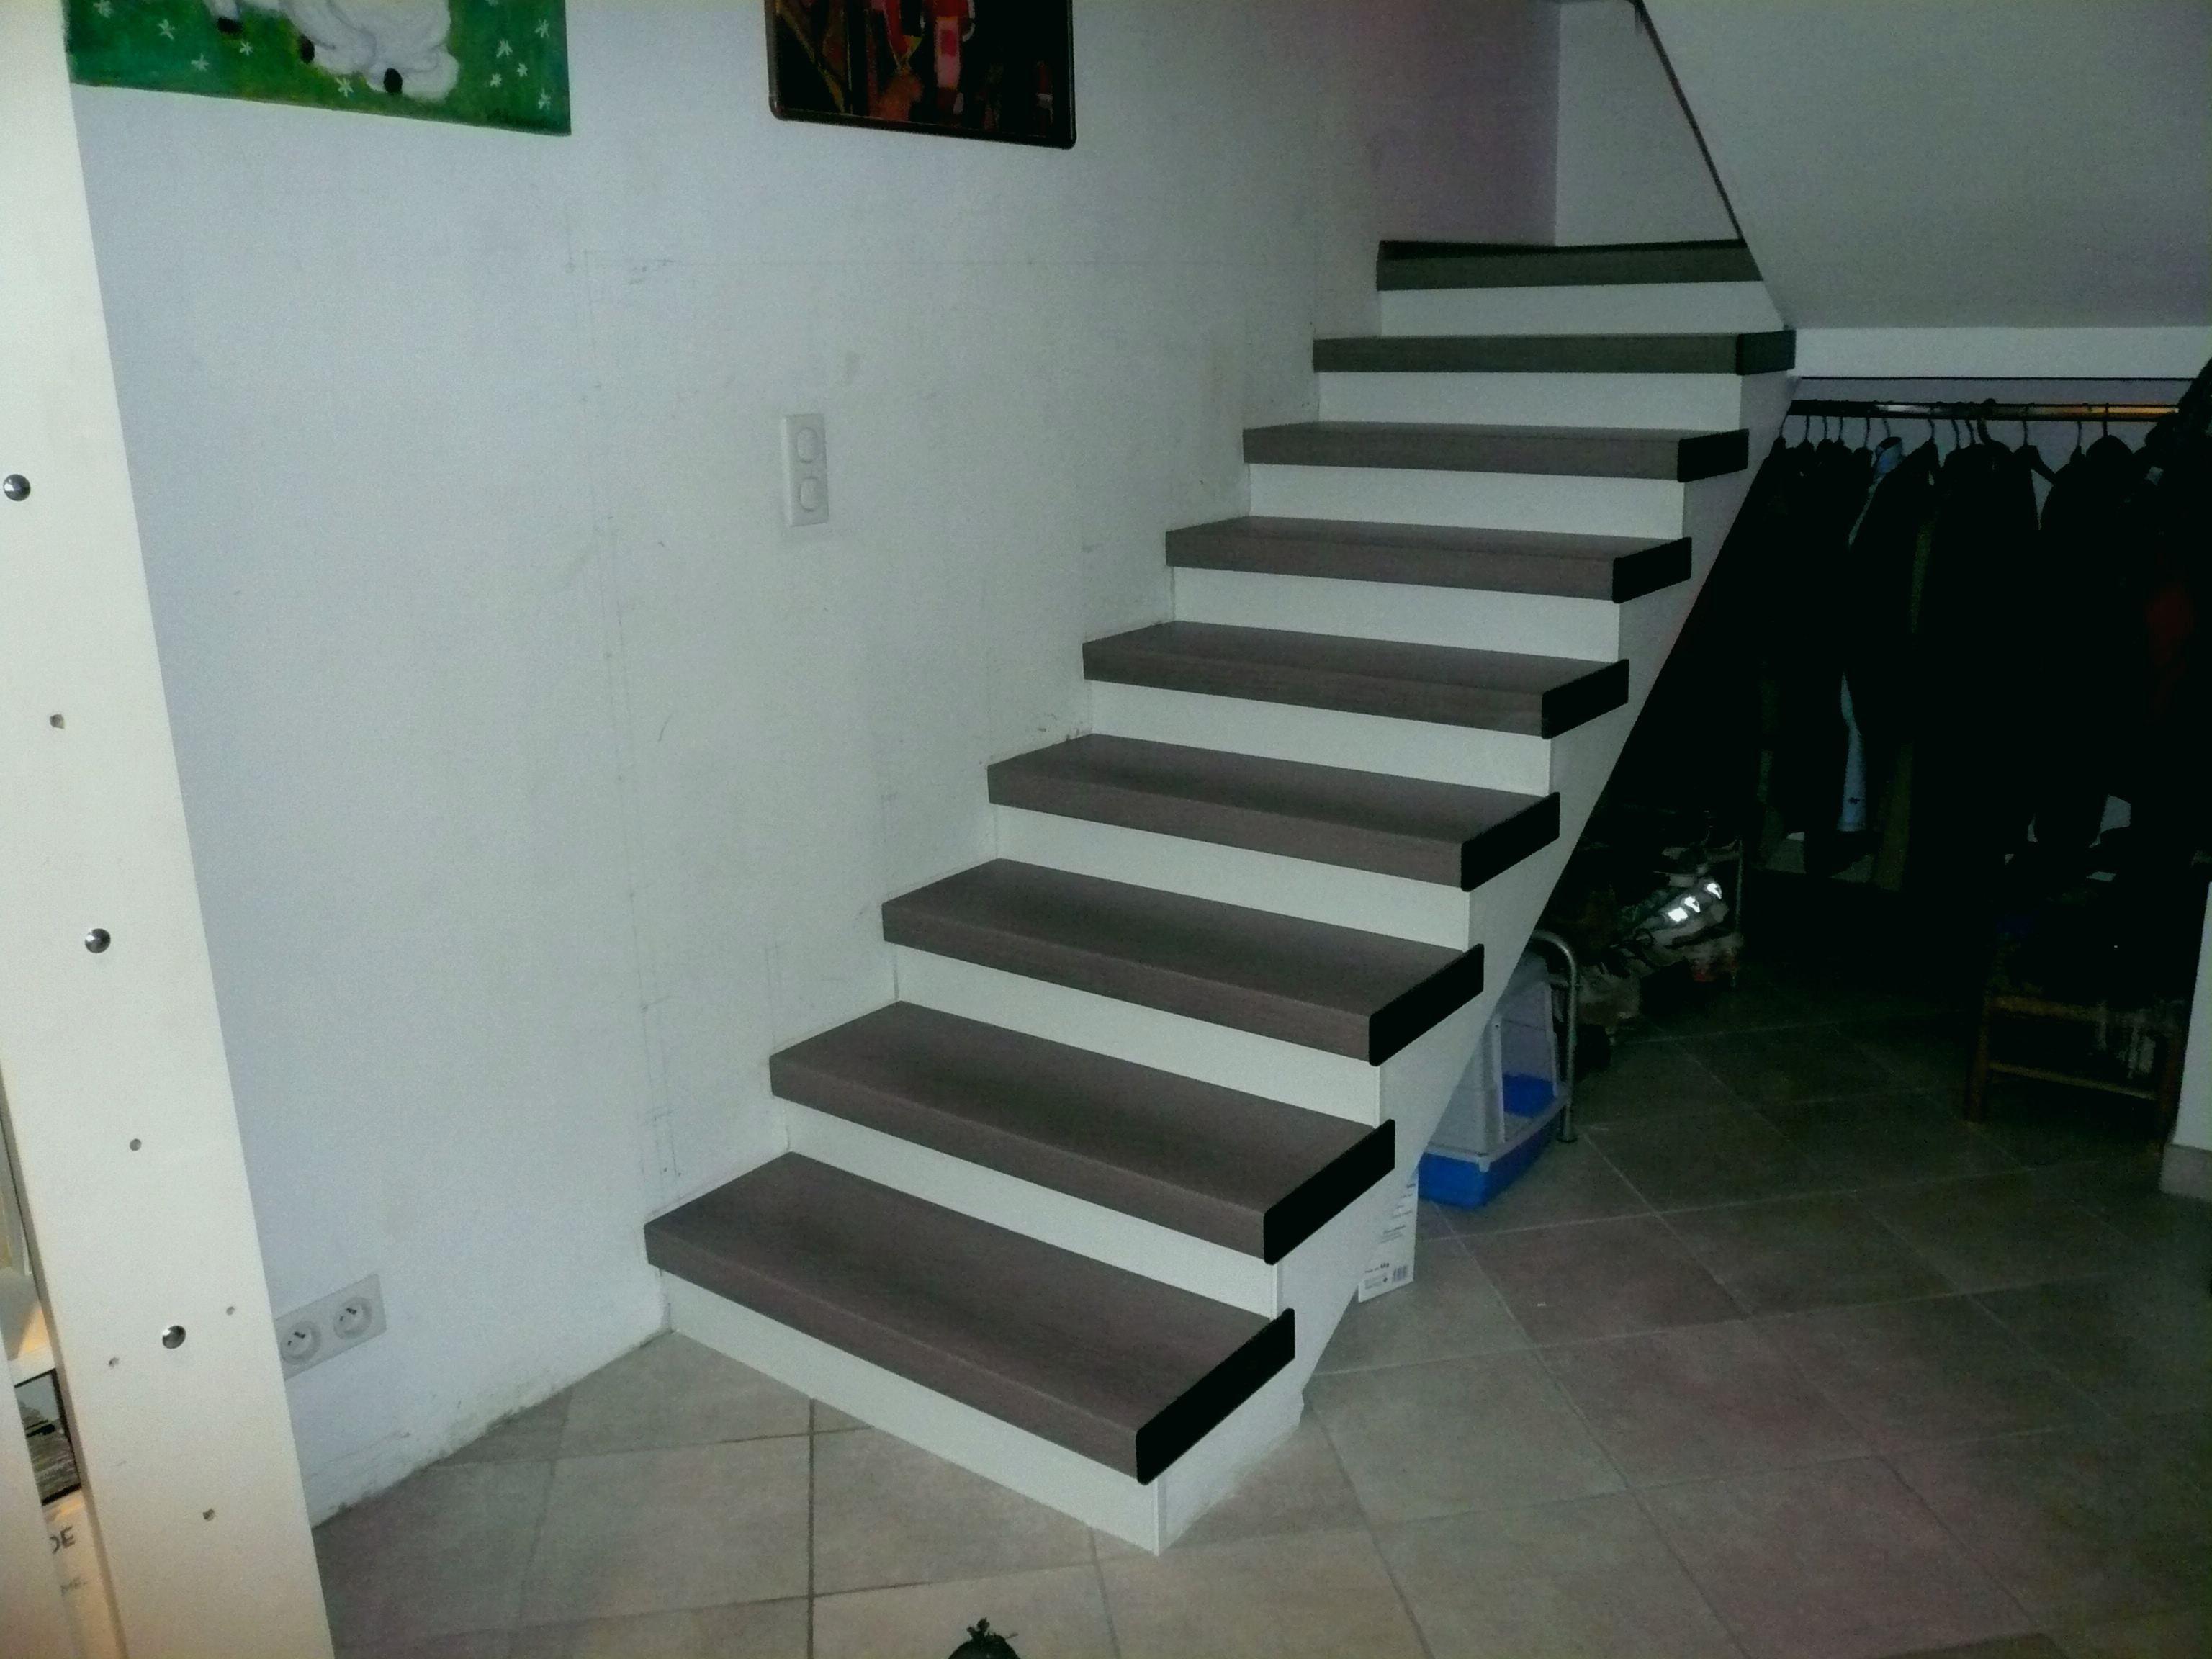 Unique Habiller Escalier Beton Exterieur Home Remodeling Basement Remodeling Remodel